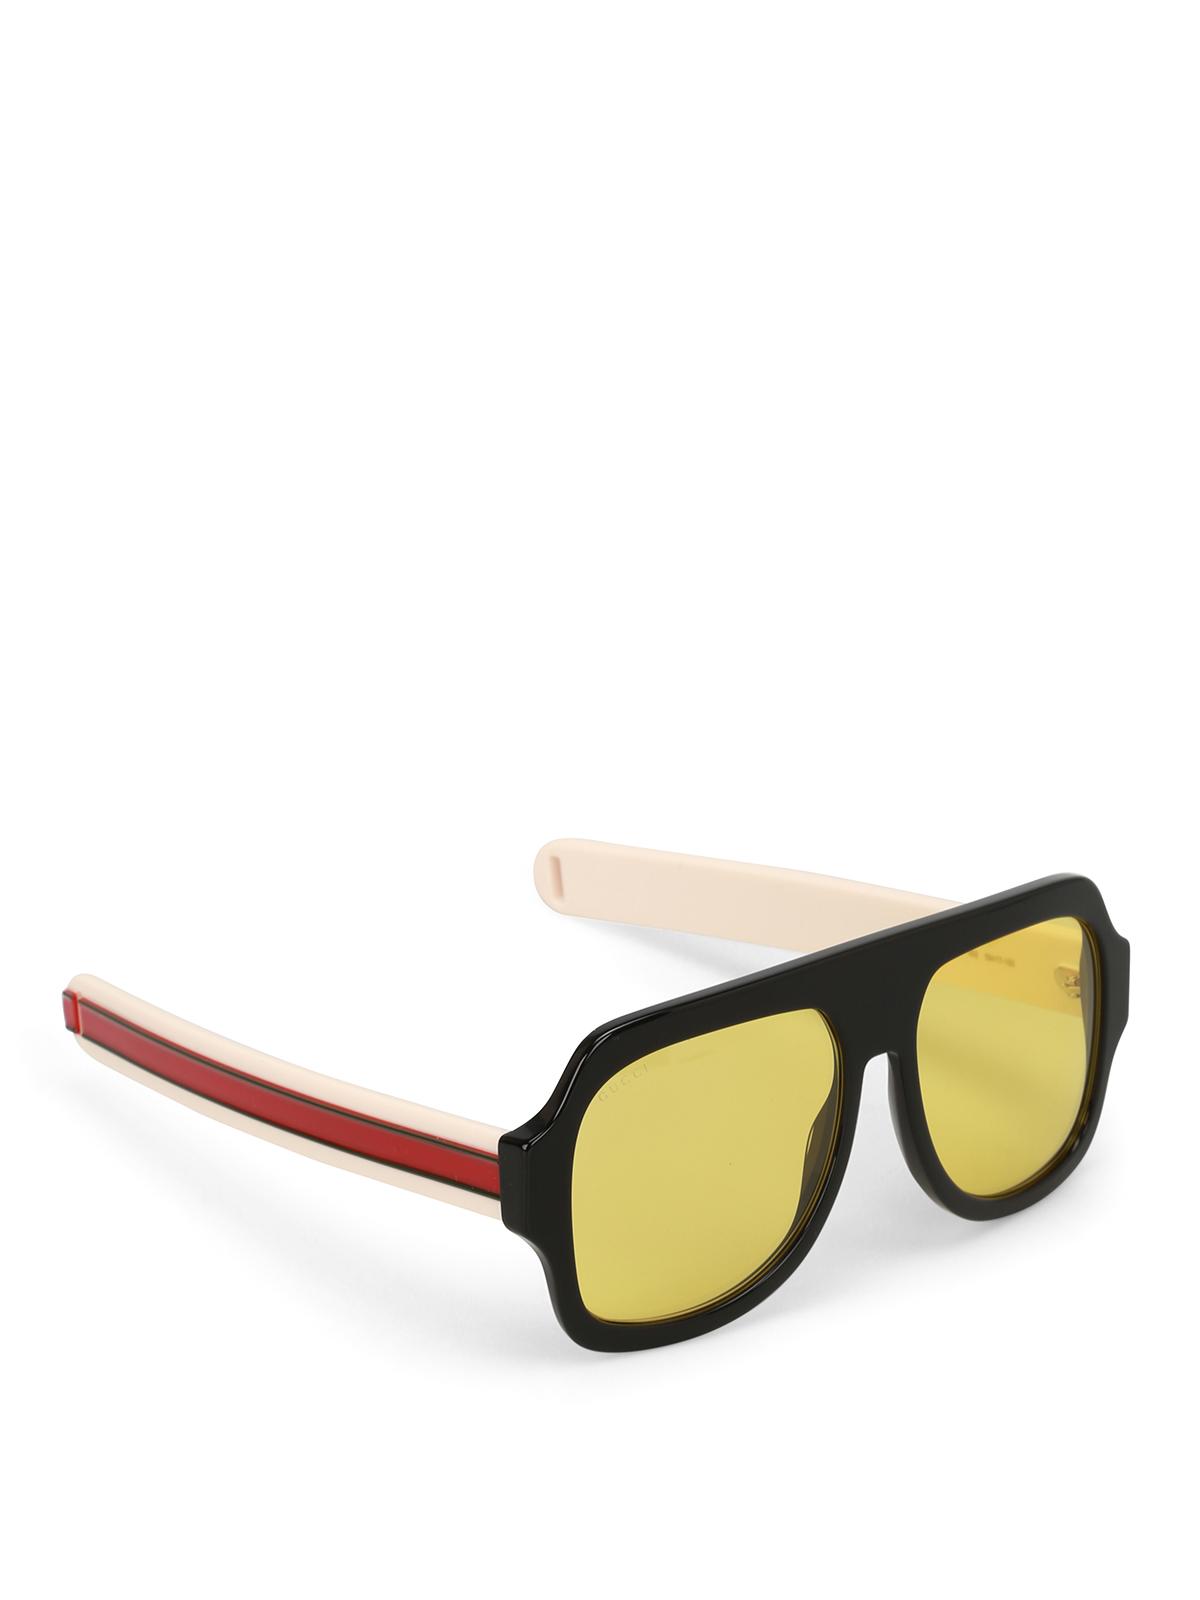 77bef021344 Gucci - Yellow lenses black mask sunglasses - sunglasses - GG0255S002